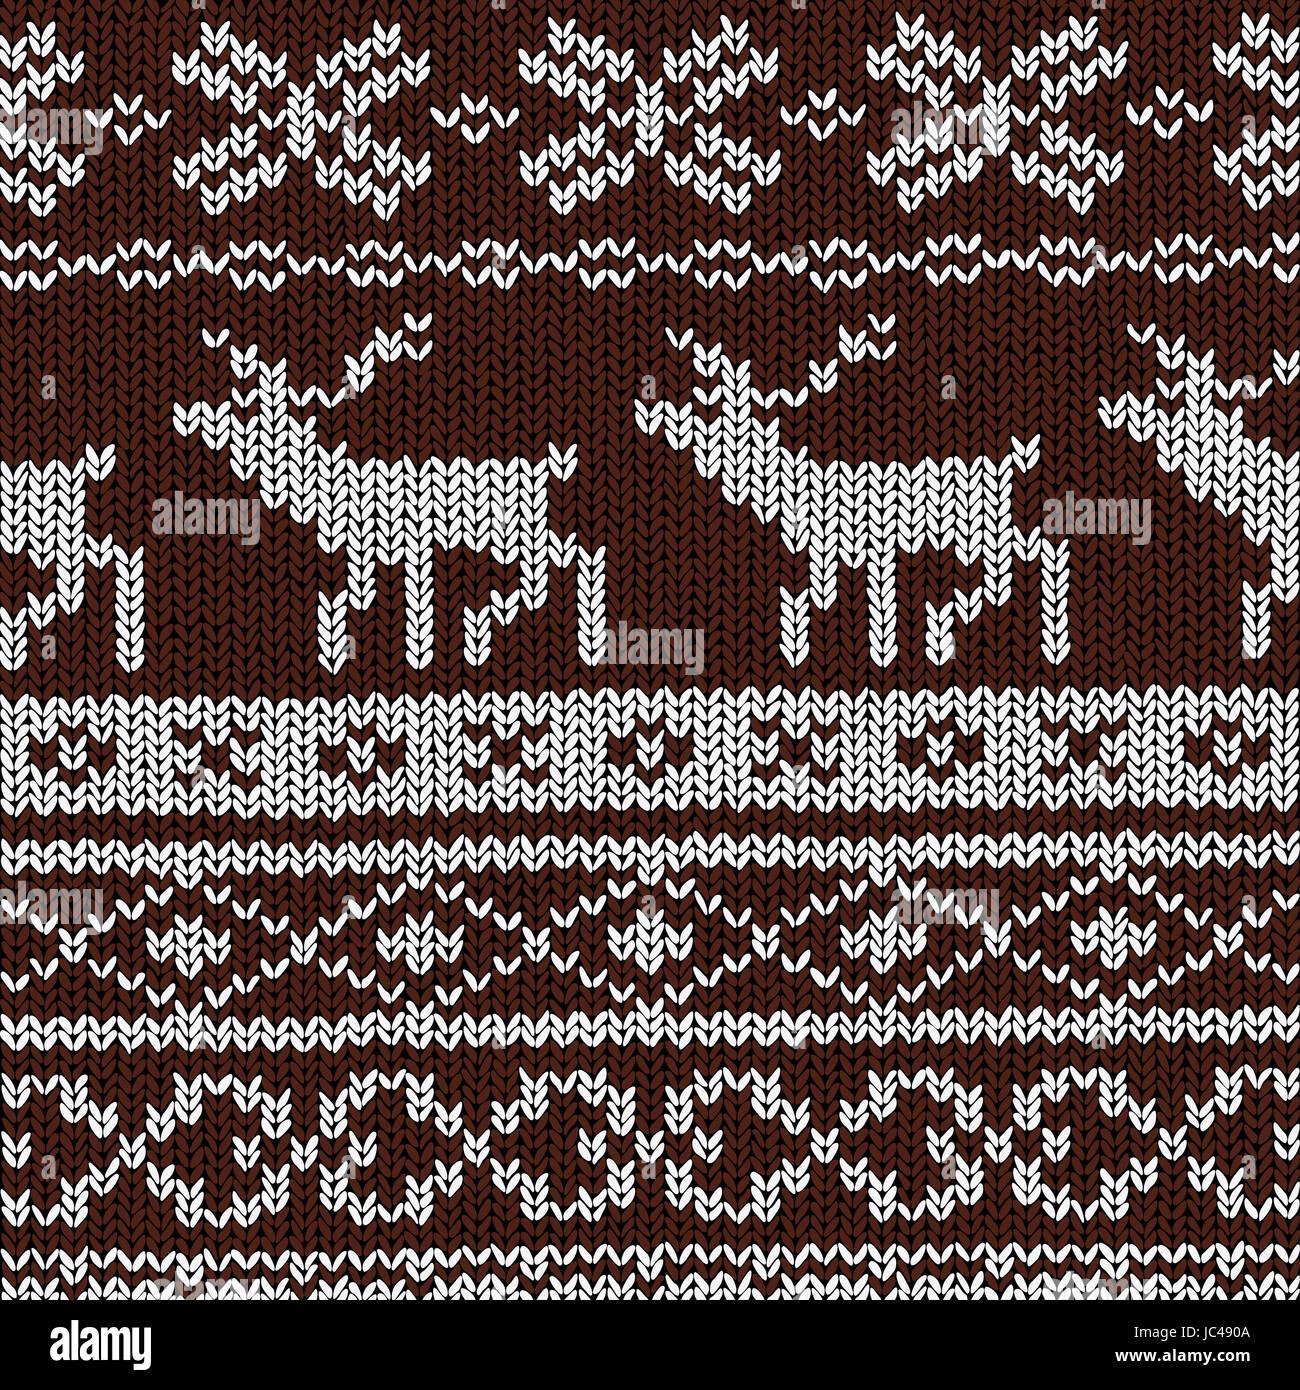 Norwegian Knitting Patterns Stock Photo Alamy